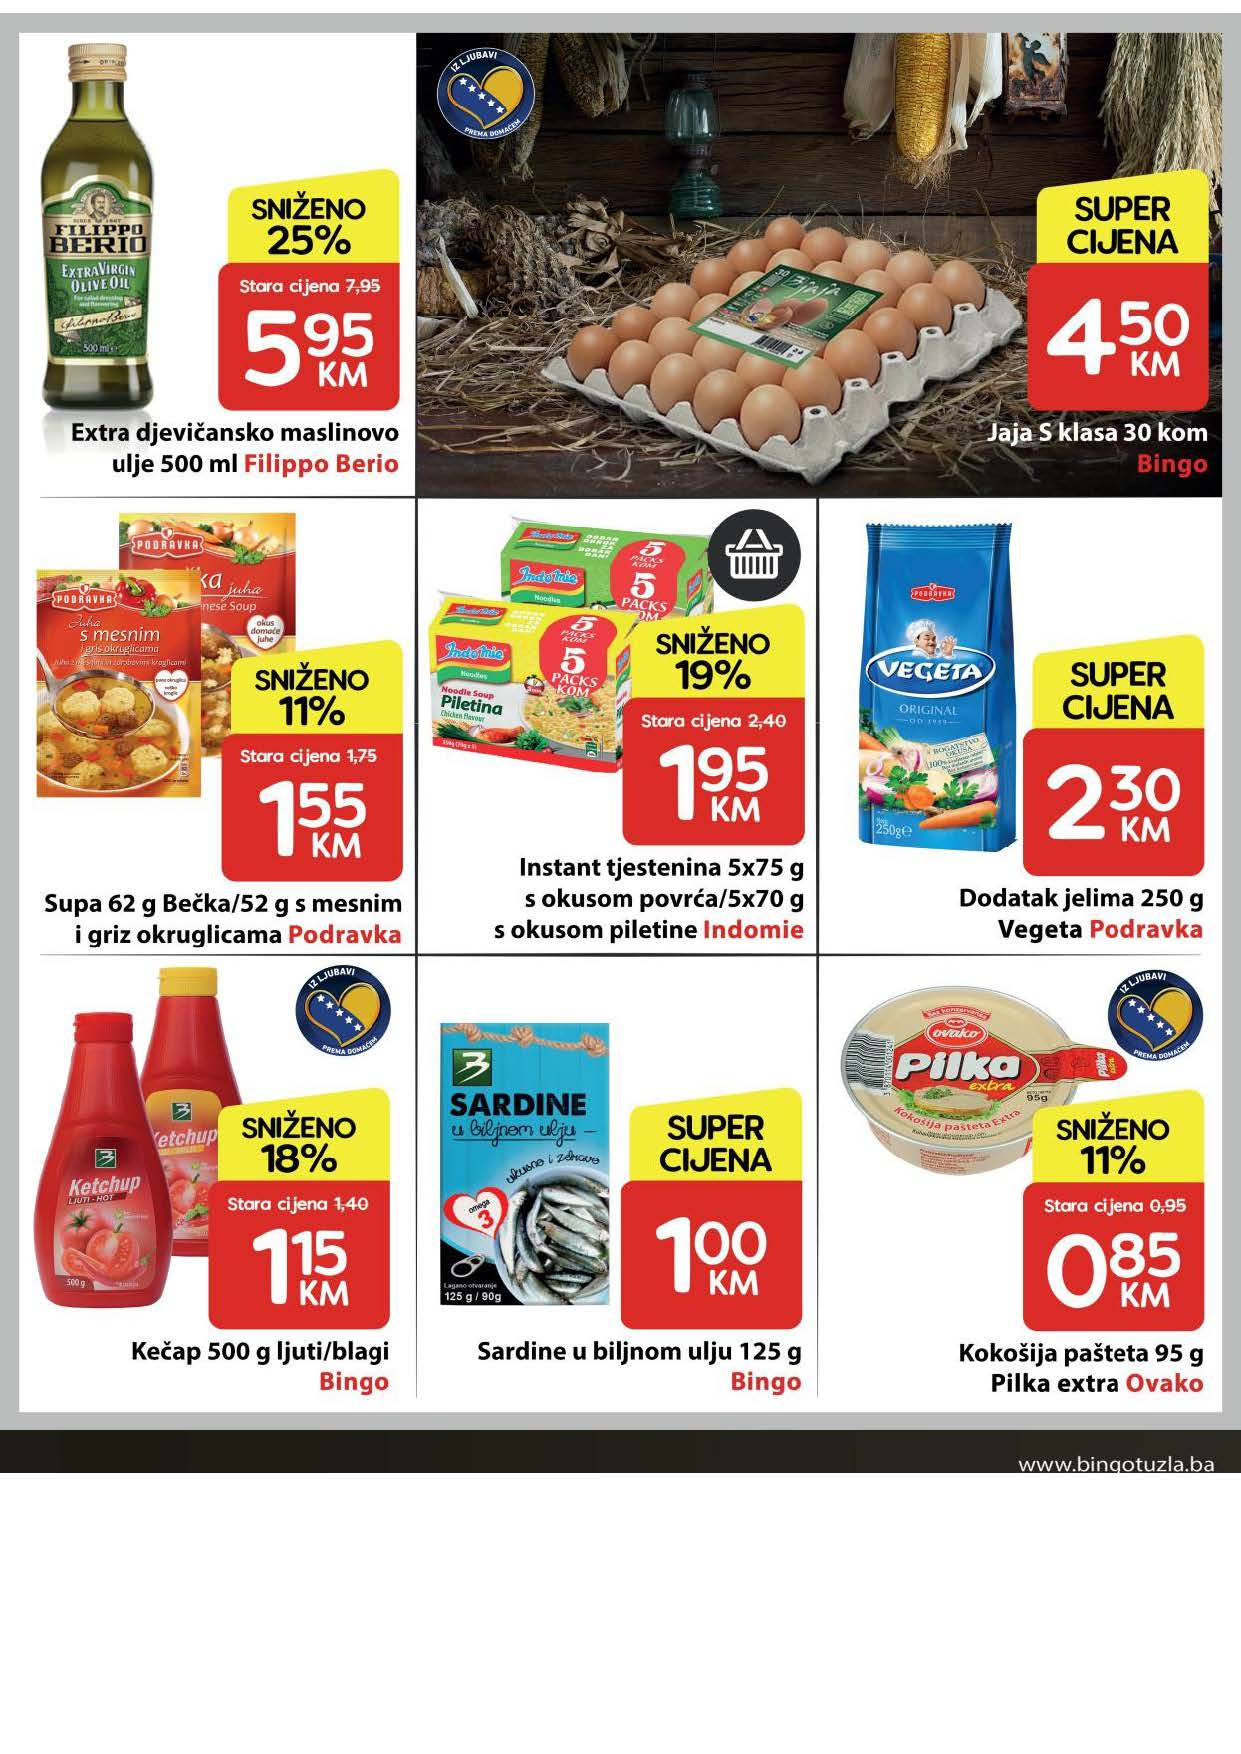 BINGO Katalog U Bingu vikend akcija traje cetiri dana JUN 2021 17.6. 20.6. eKatalozi.com PR Page 3